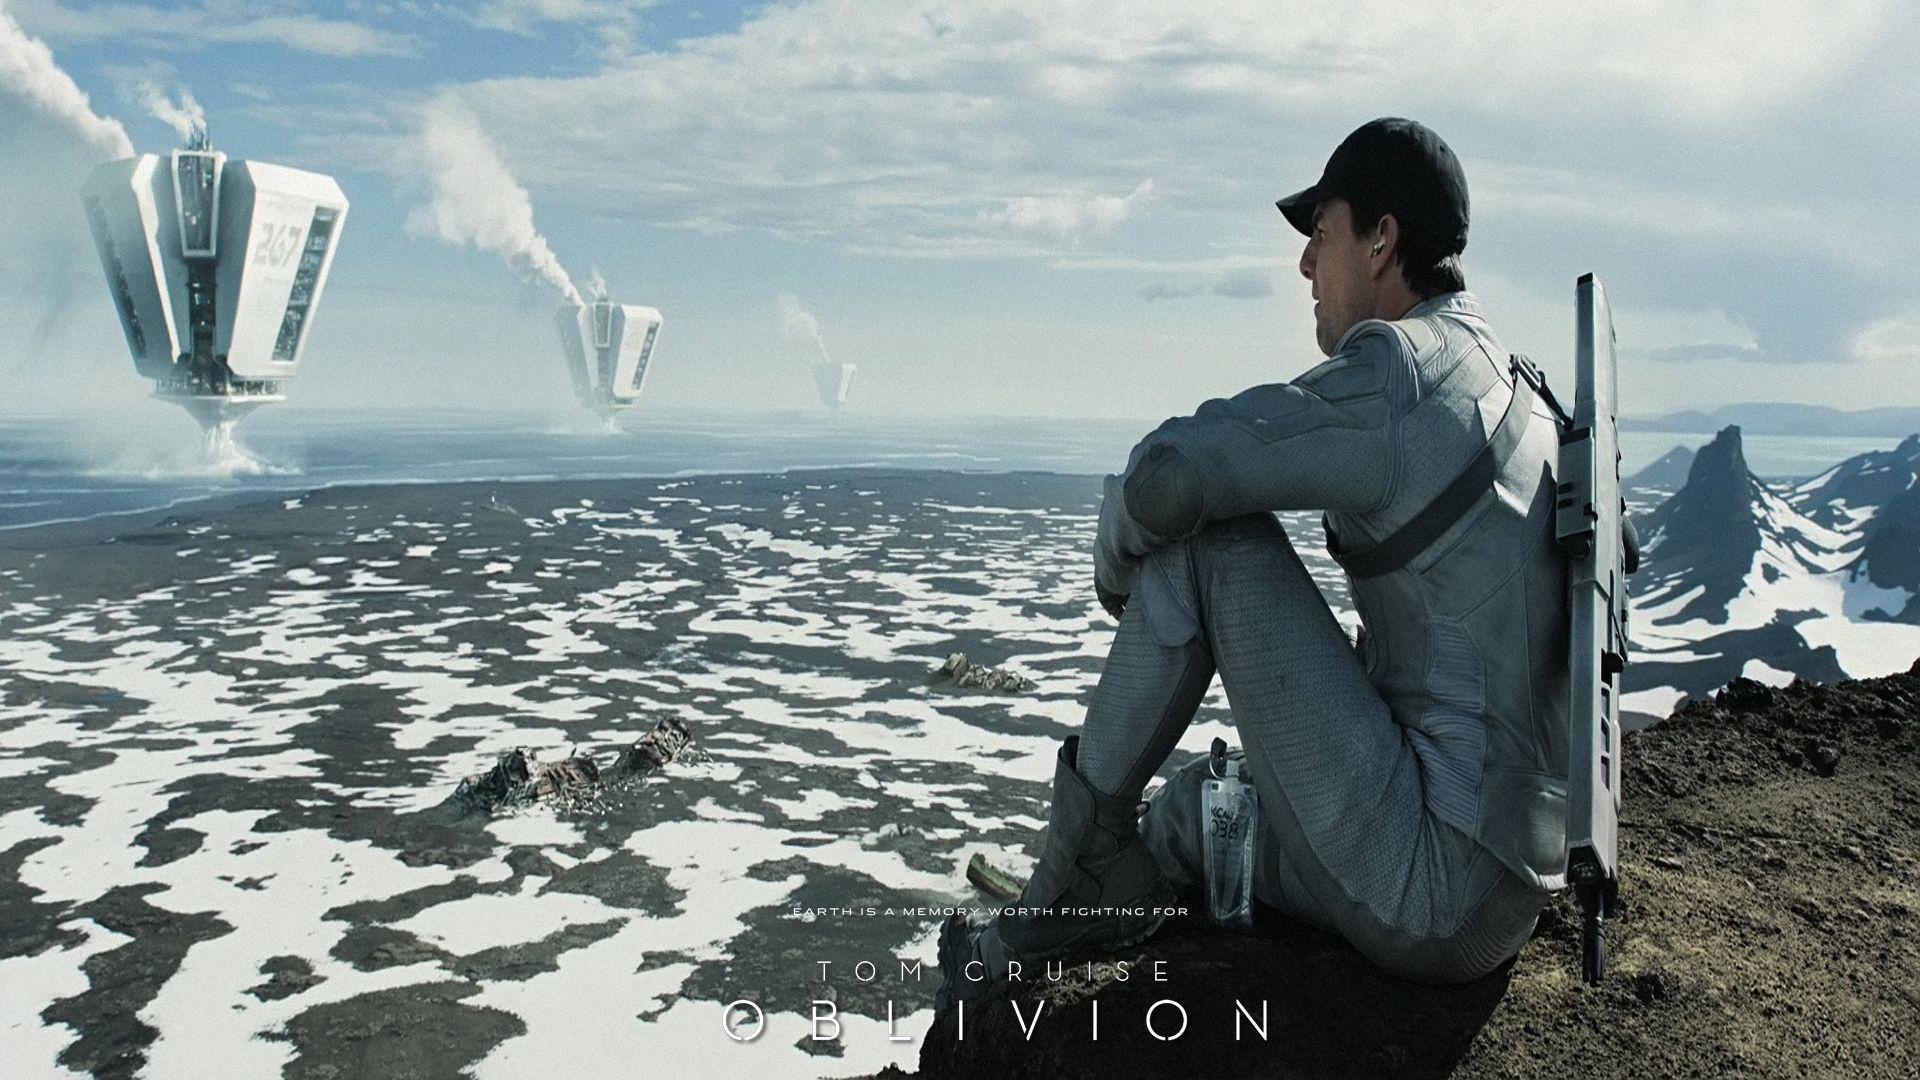 Tom Cruise Oblivion Movies Wallpaper 1080p